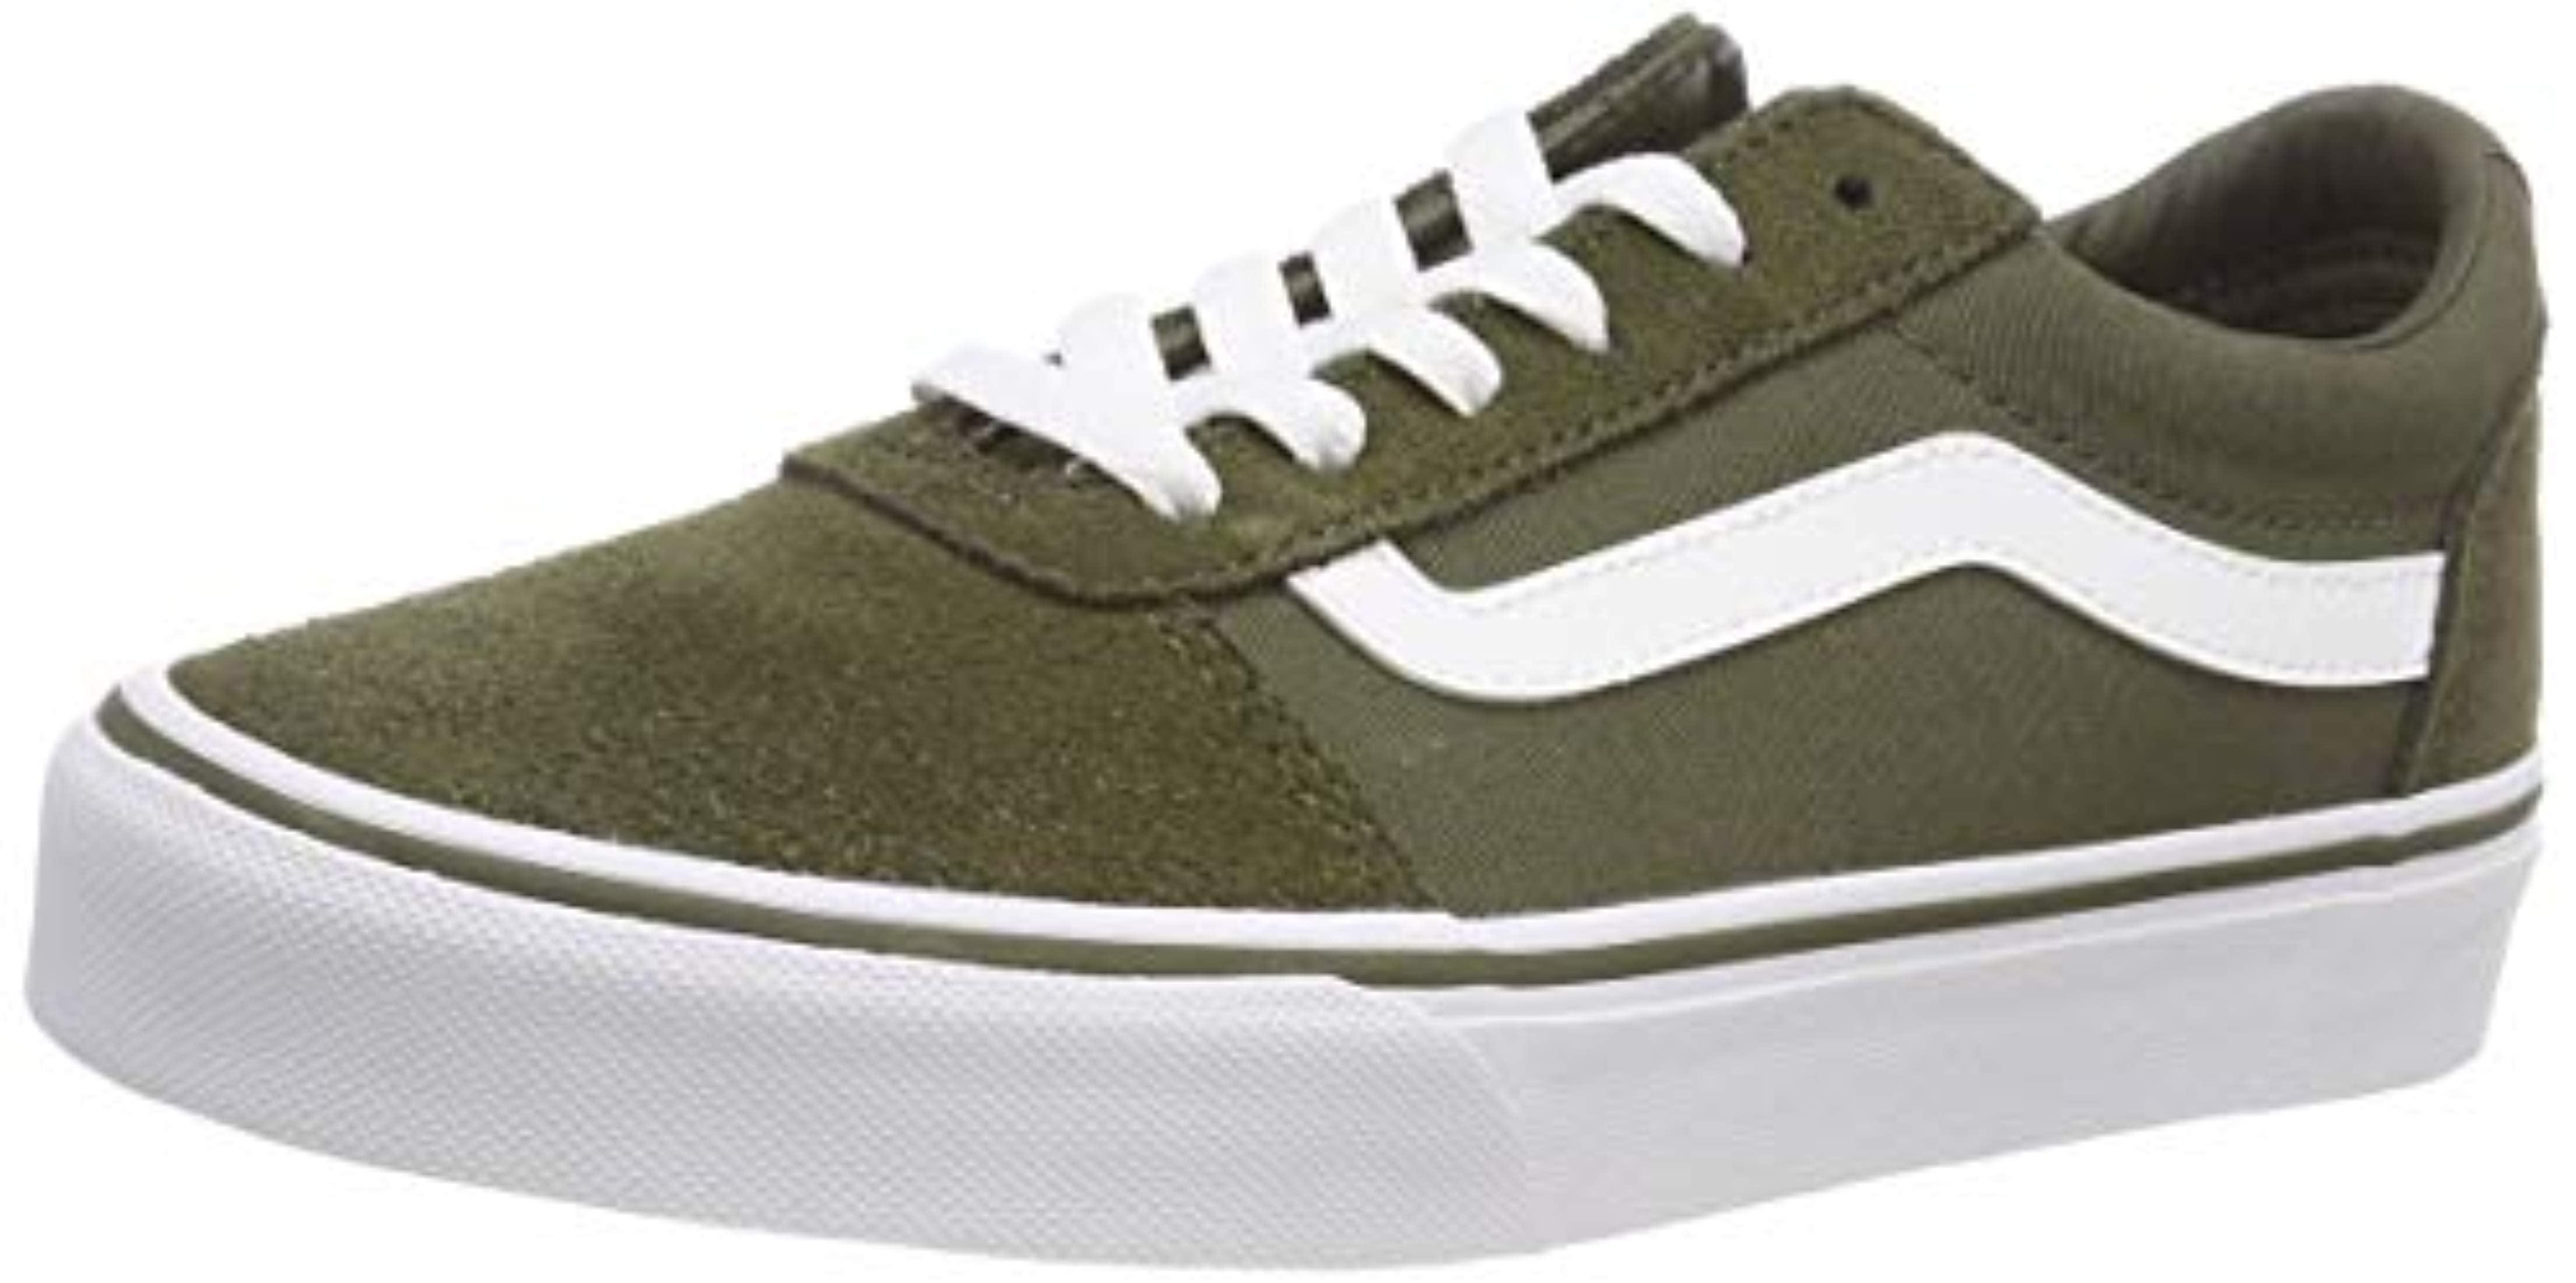 Vans - Vans Women S Ward Low-Top Sneakers ae831275f